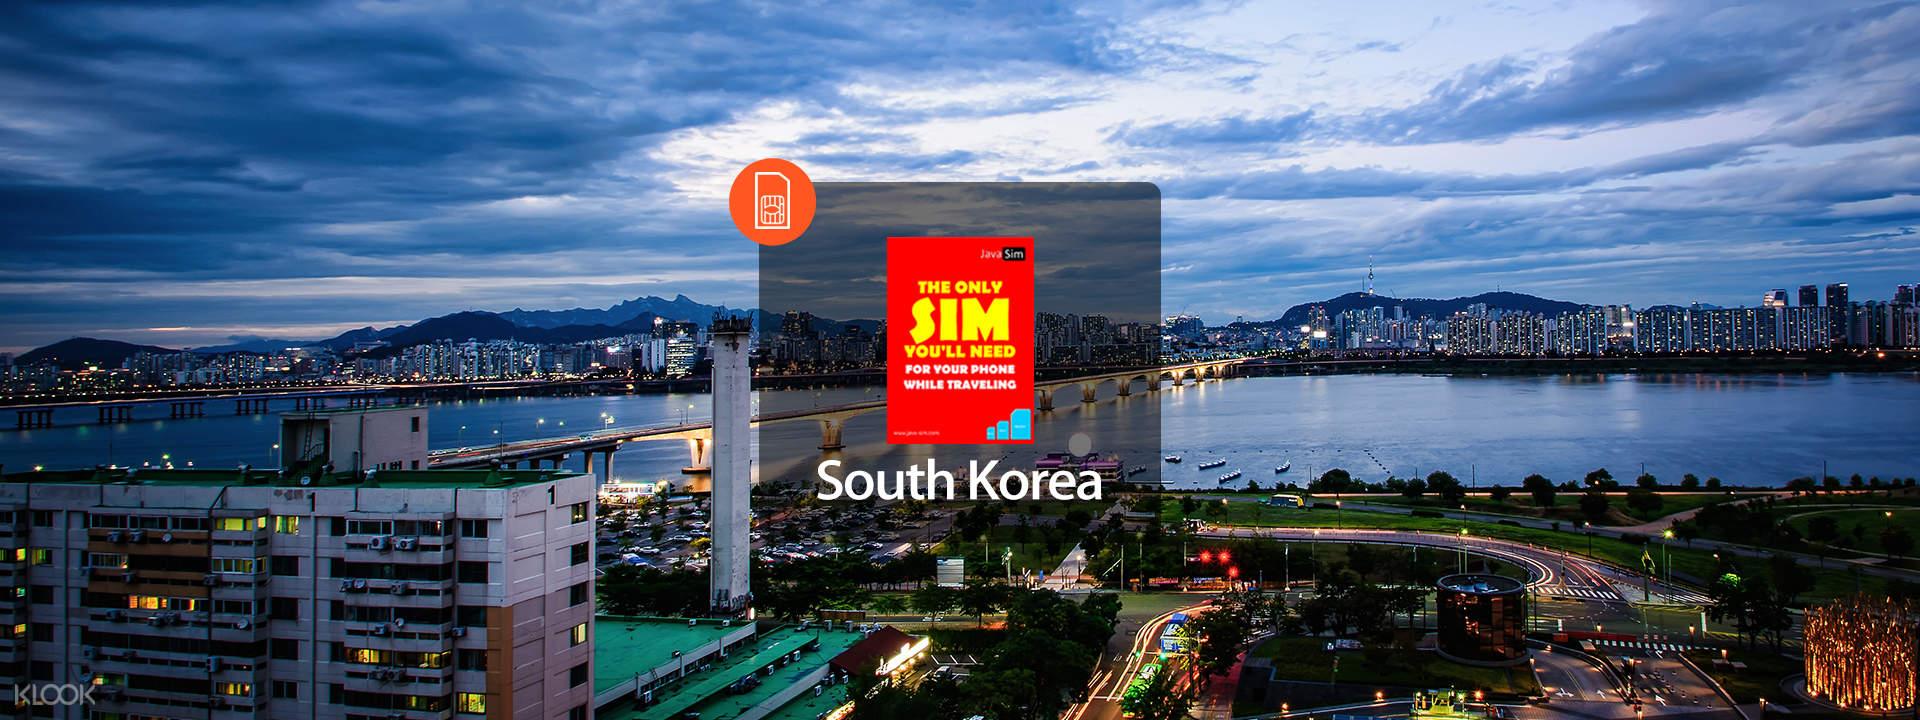 SIM Card 4G dari JavaMifi untuk Korea Selatan (Pengambilan ...